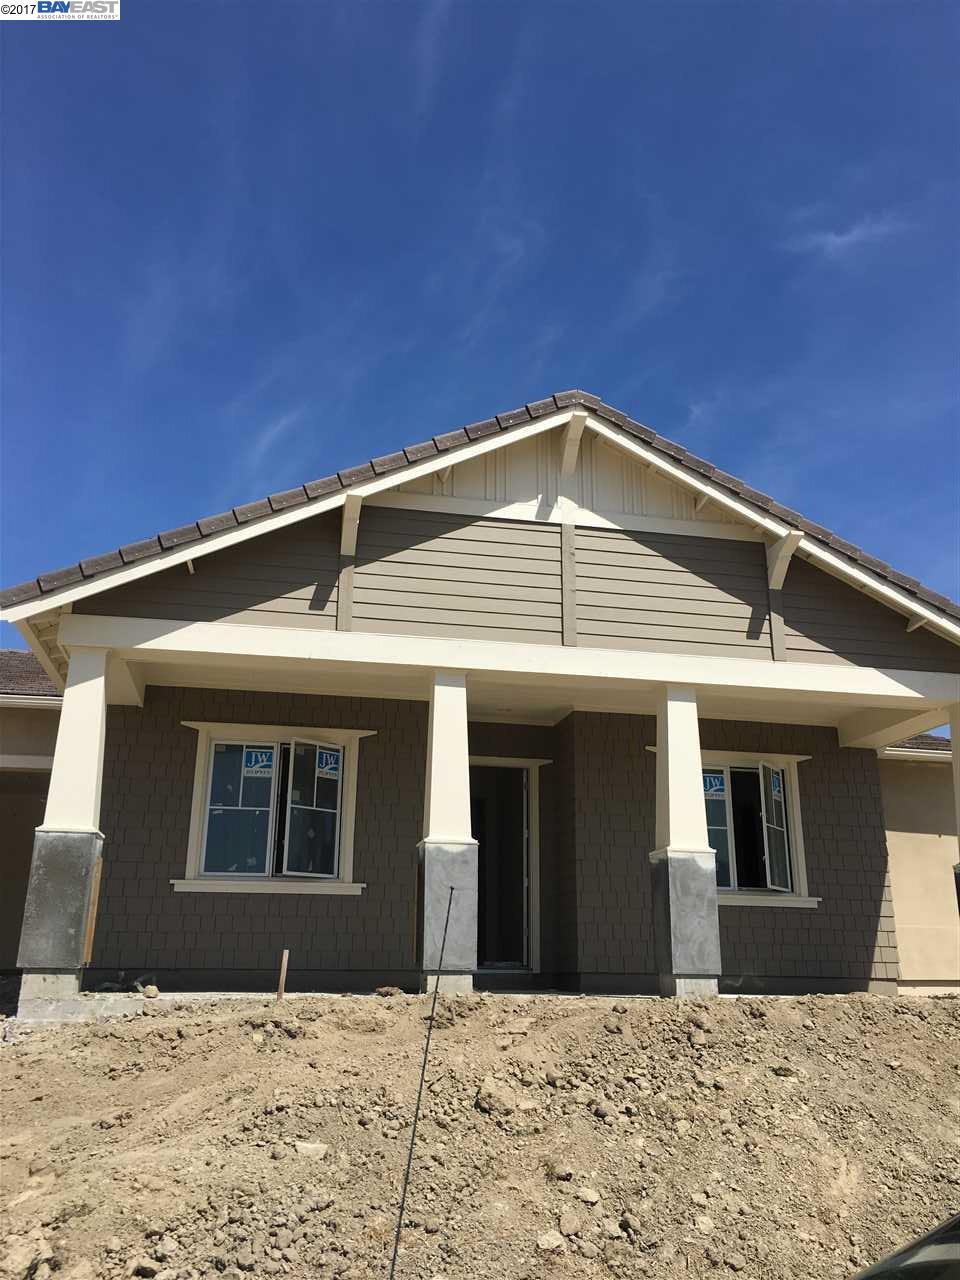 Single Family Home for Sale at 209 Willowbrook Lane Moraga, California 94556 United States